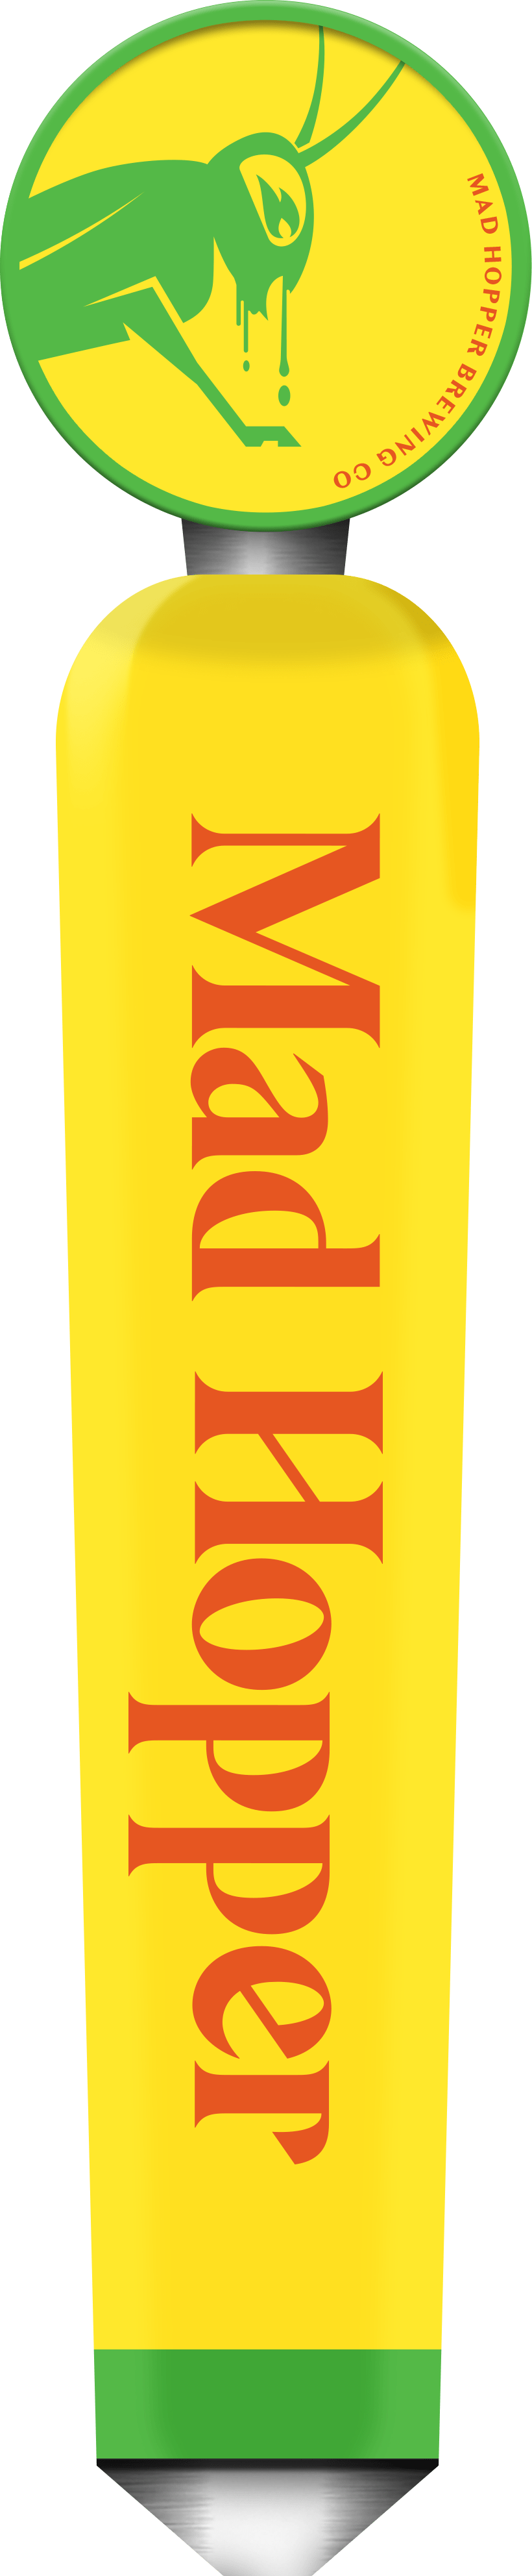 Mango Tango New England IPA beer tap label, Mad Hopper Brewing Co., Helsinki, Finland